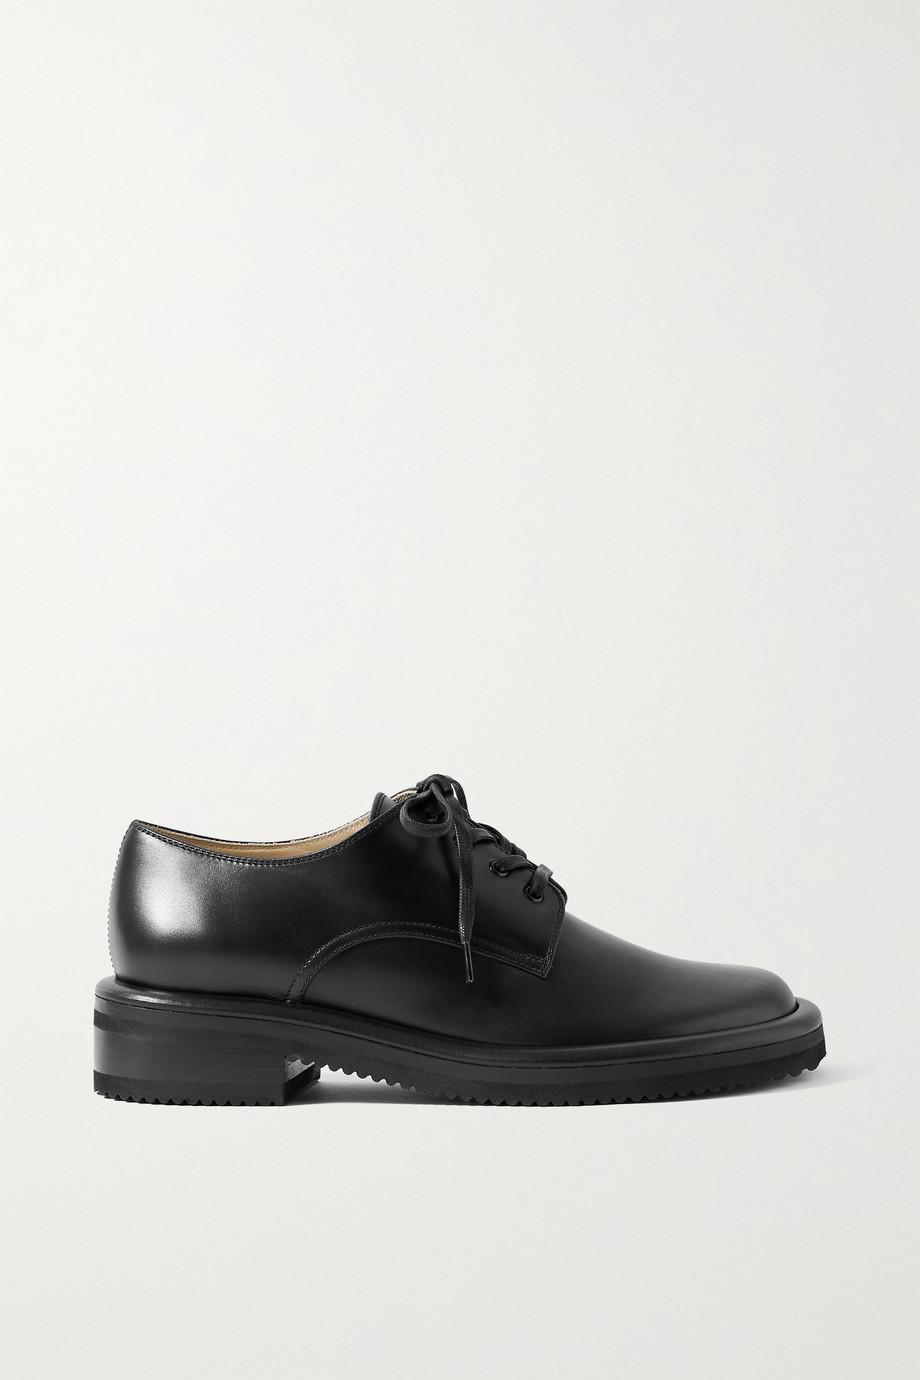 Proenza Schouler Leather brogues